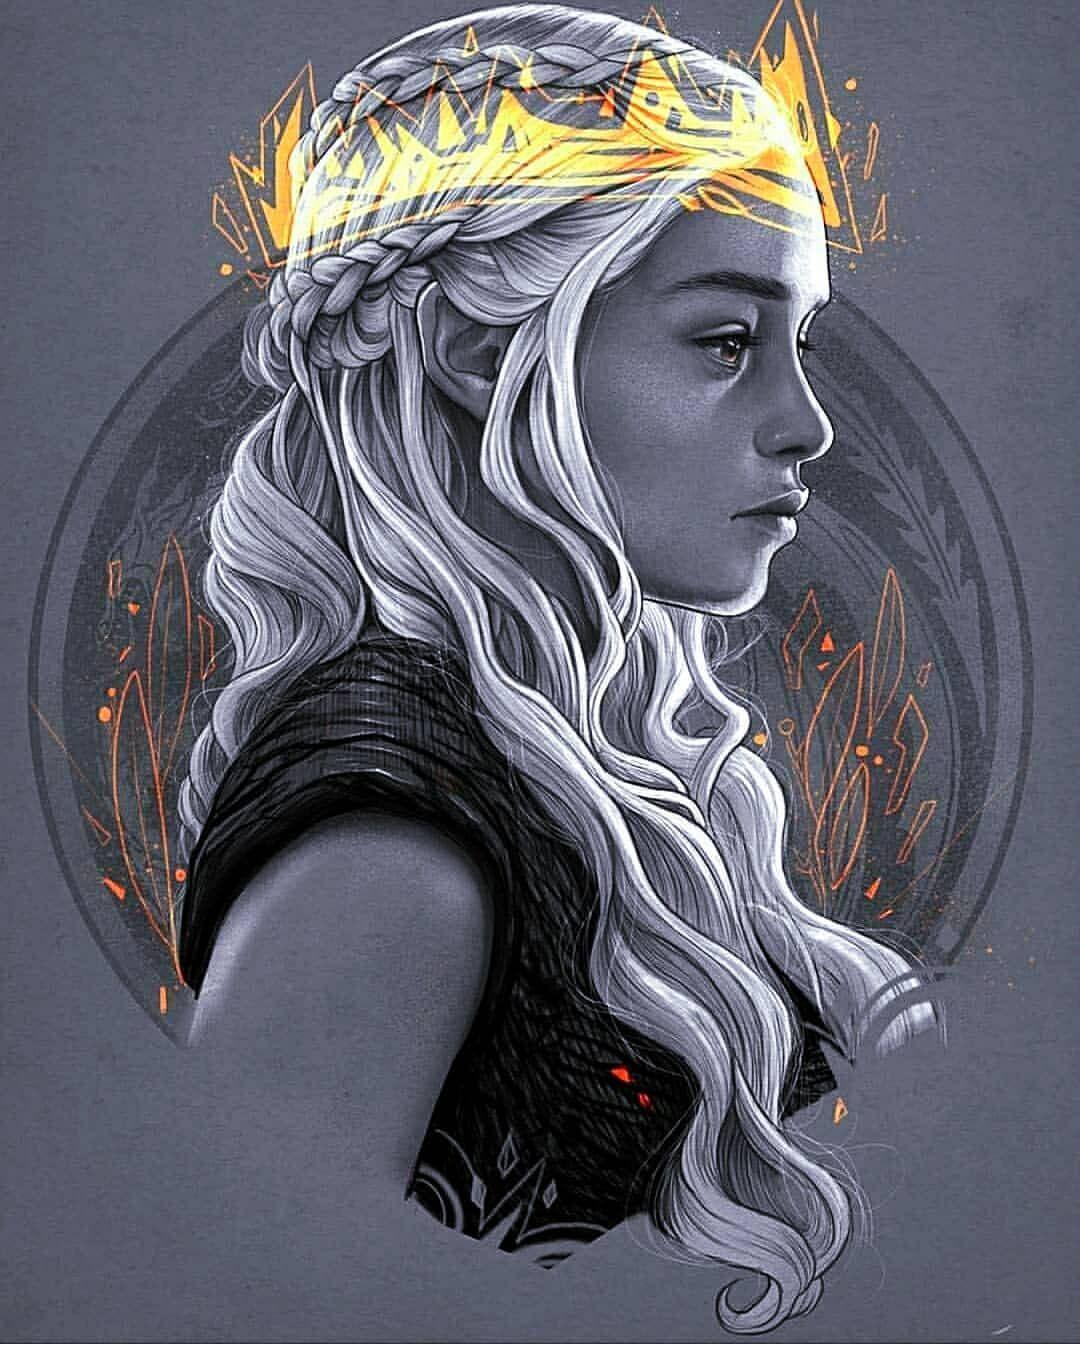 Cool Daenerys Targaryen Artwork Gameofthrones Gameofthronesart